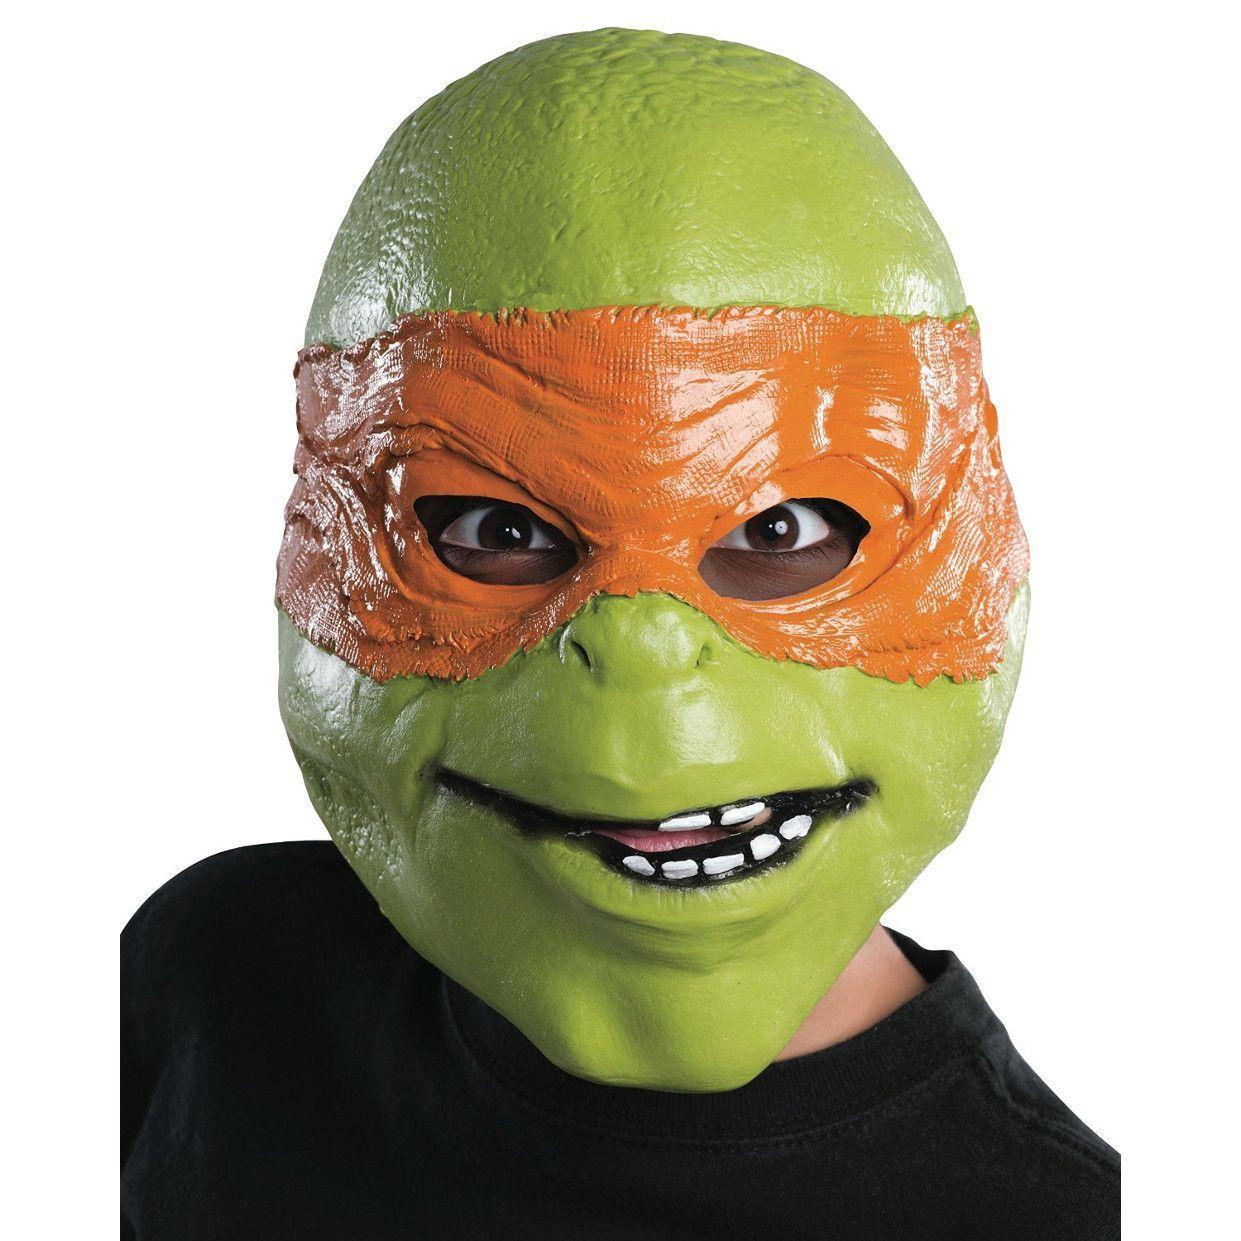 Ninja Turtles Halloween Costumes For Kids